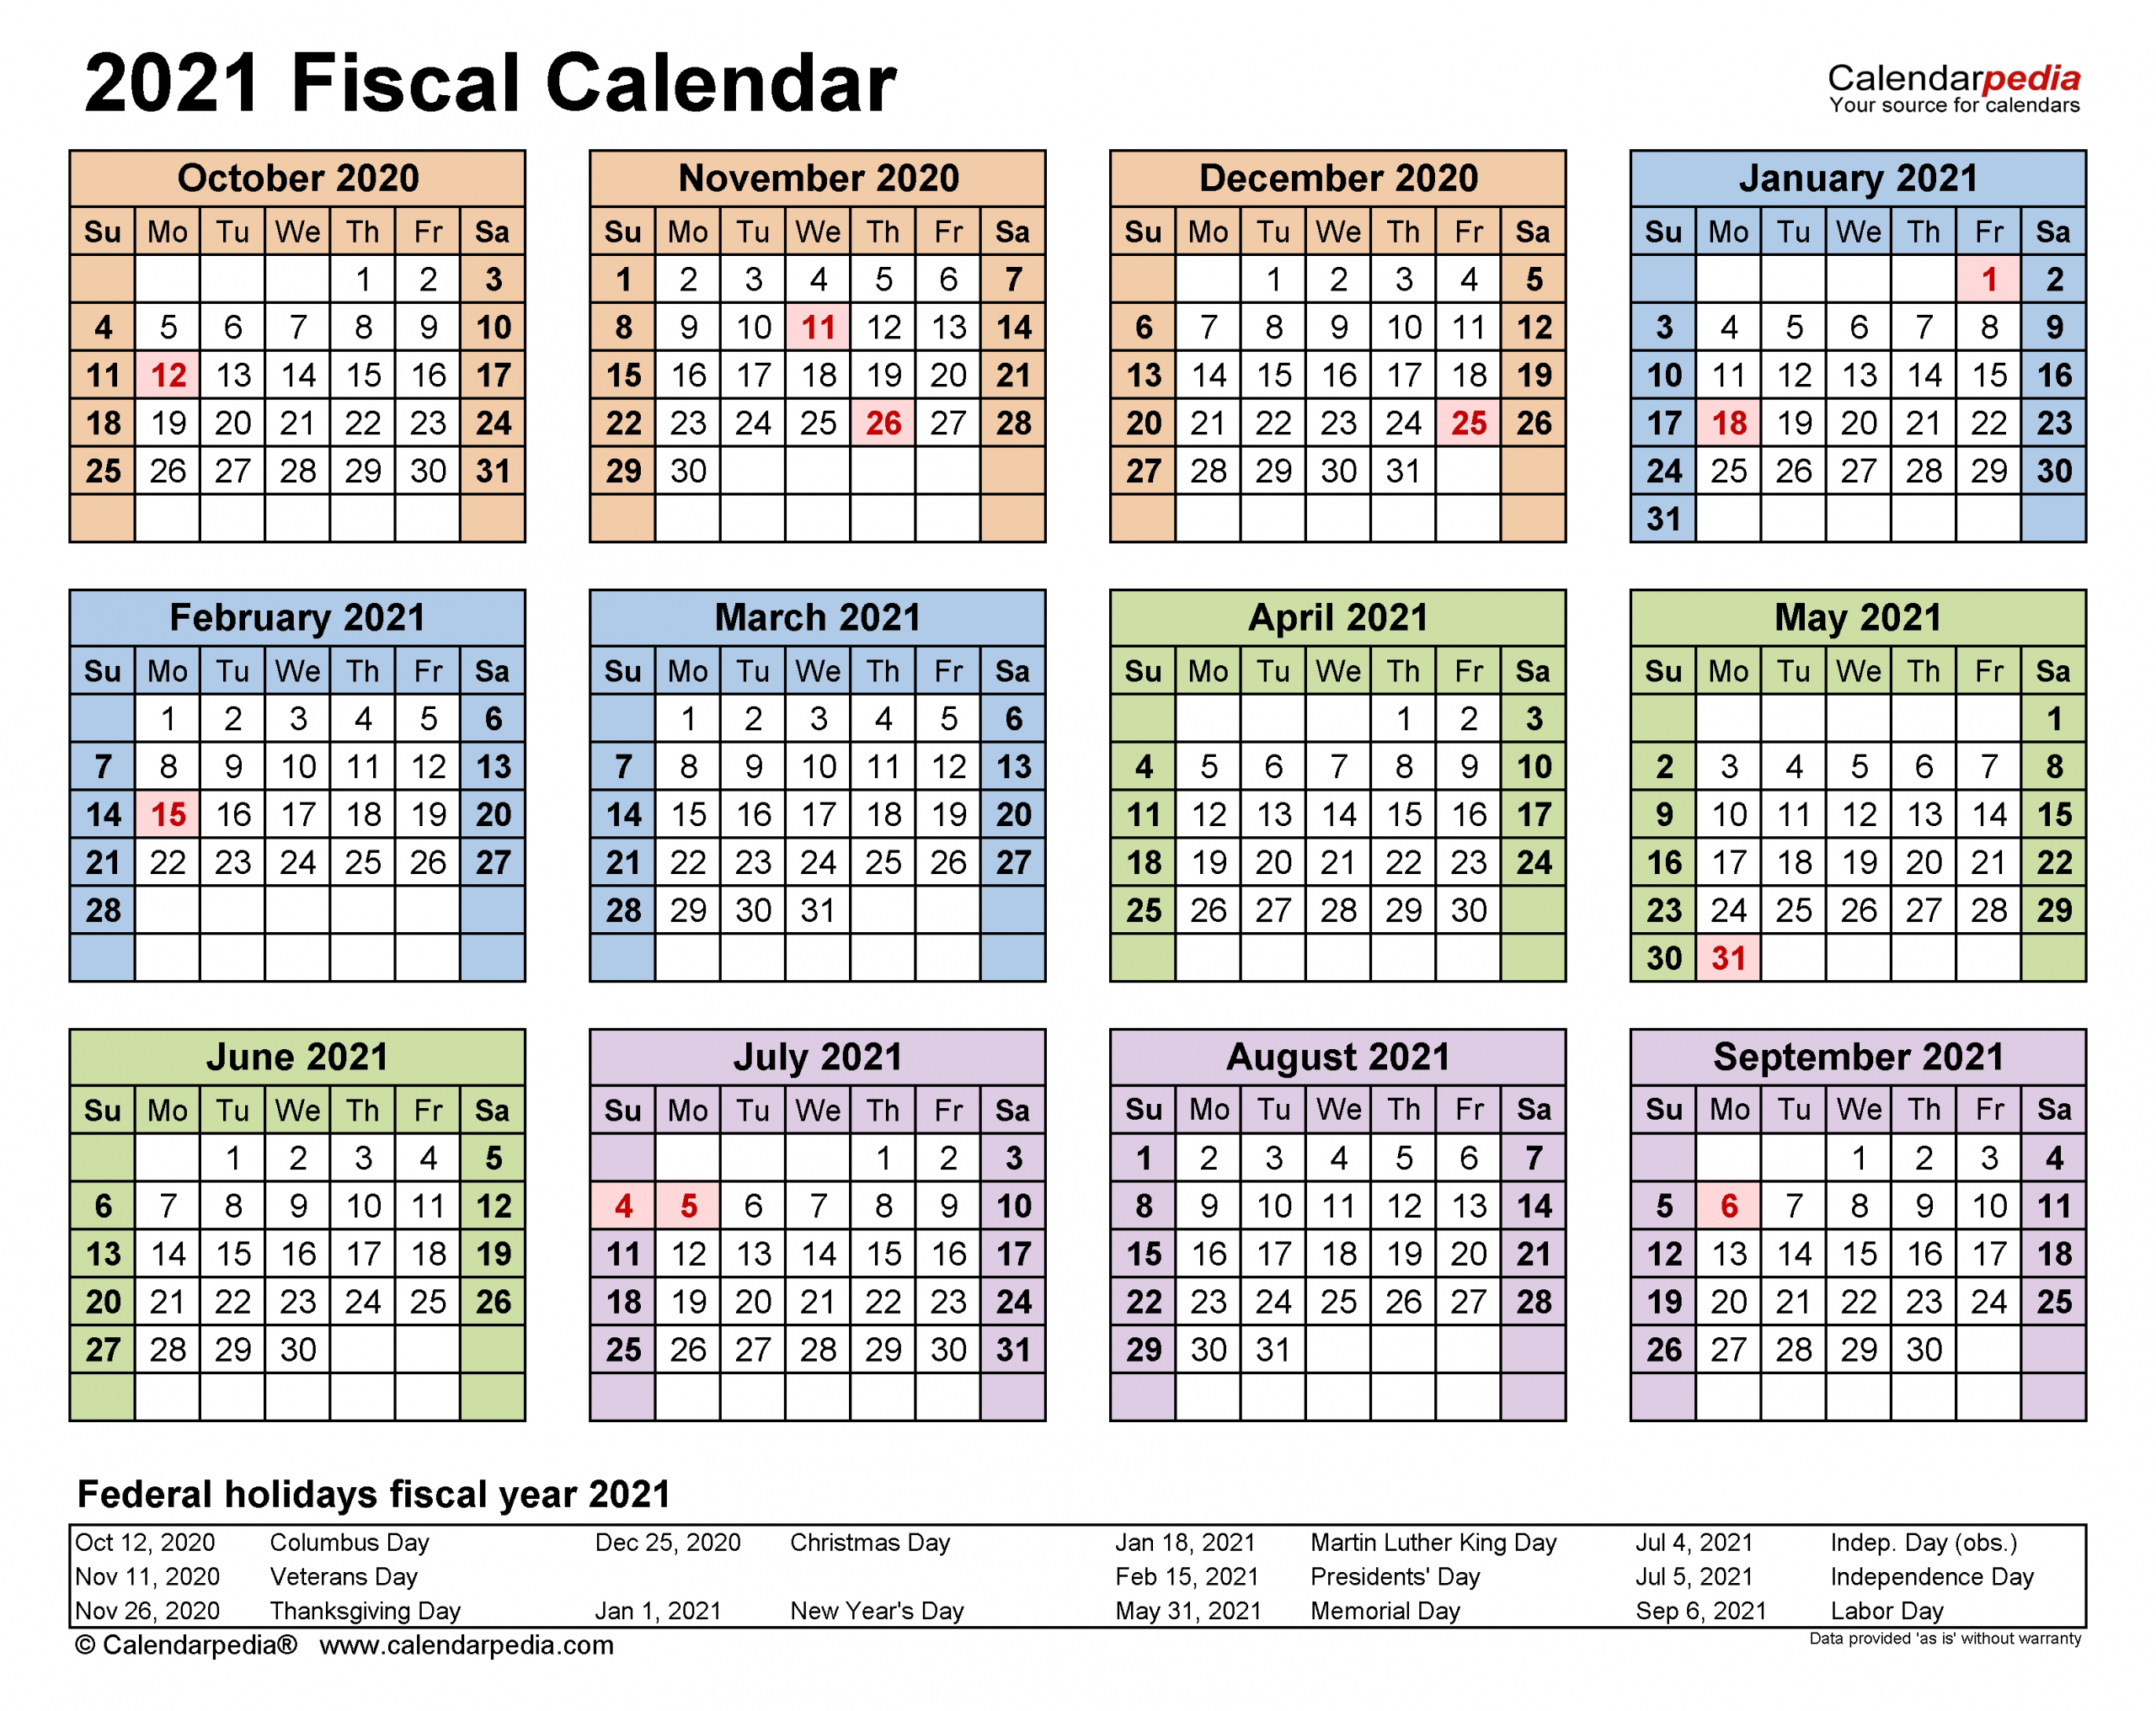 Payroll Calendar 2021 Ontario | Payroll Calendar 2021 regarding Federal Civilian Pay Calendar 2020